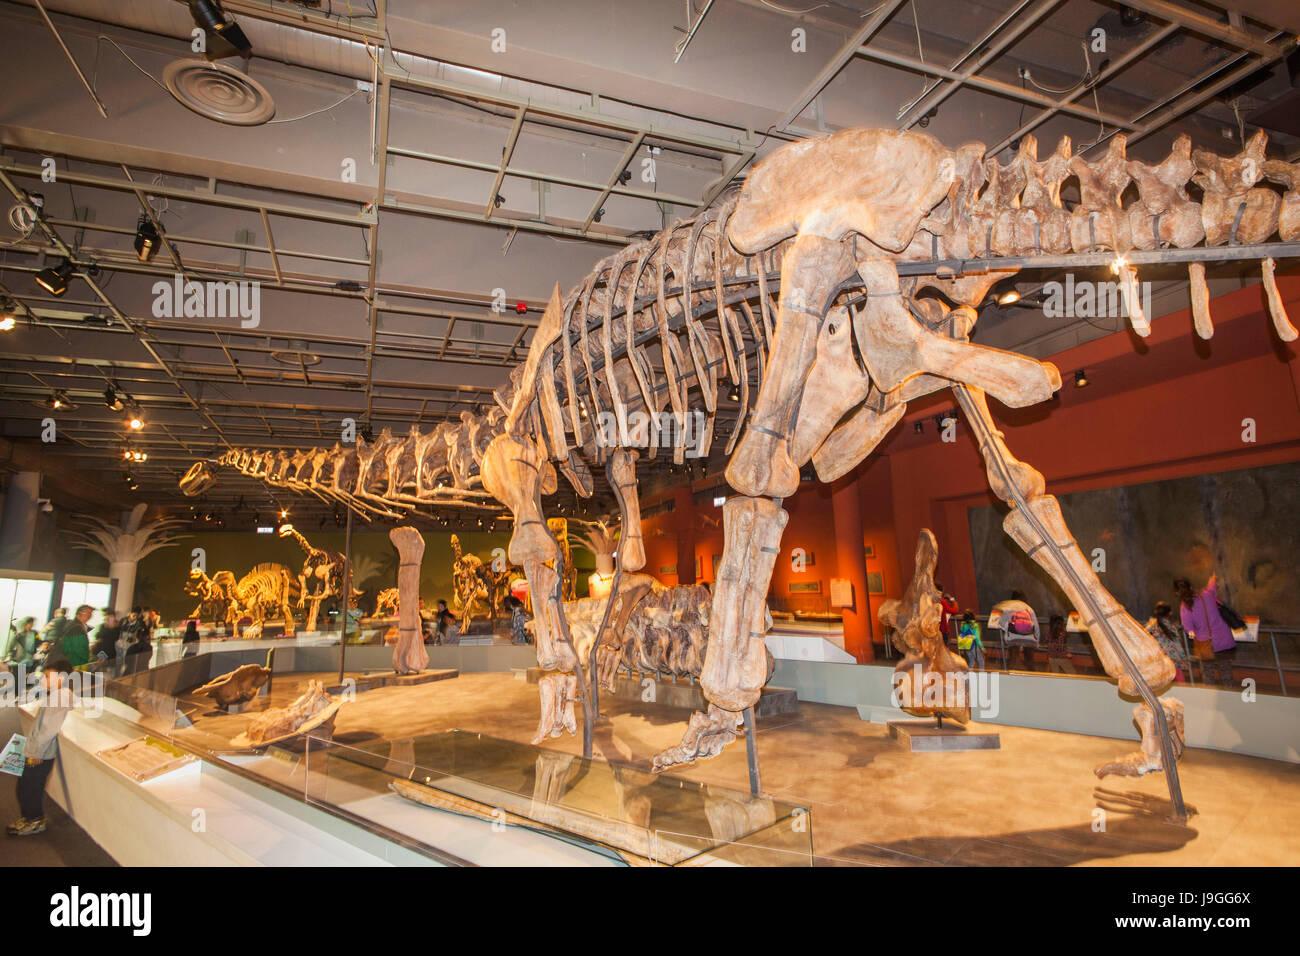 Dinosaur Bone Stock Photos Images Page 3 Alamy Titan Joger China Skelton Of Daxiatitan Binglingi Image